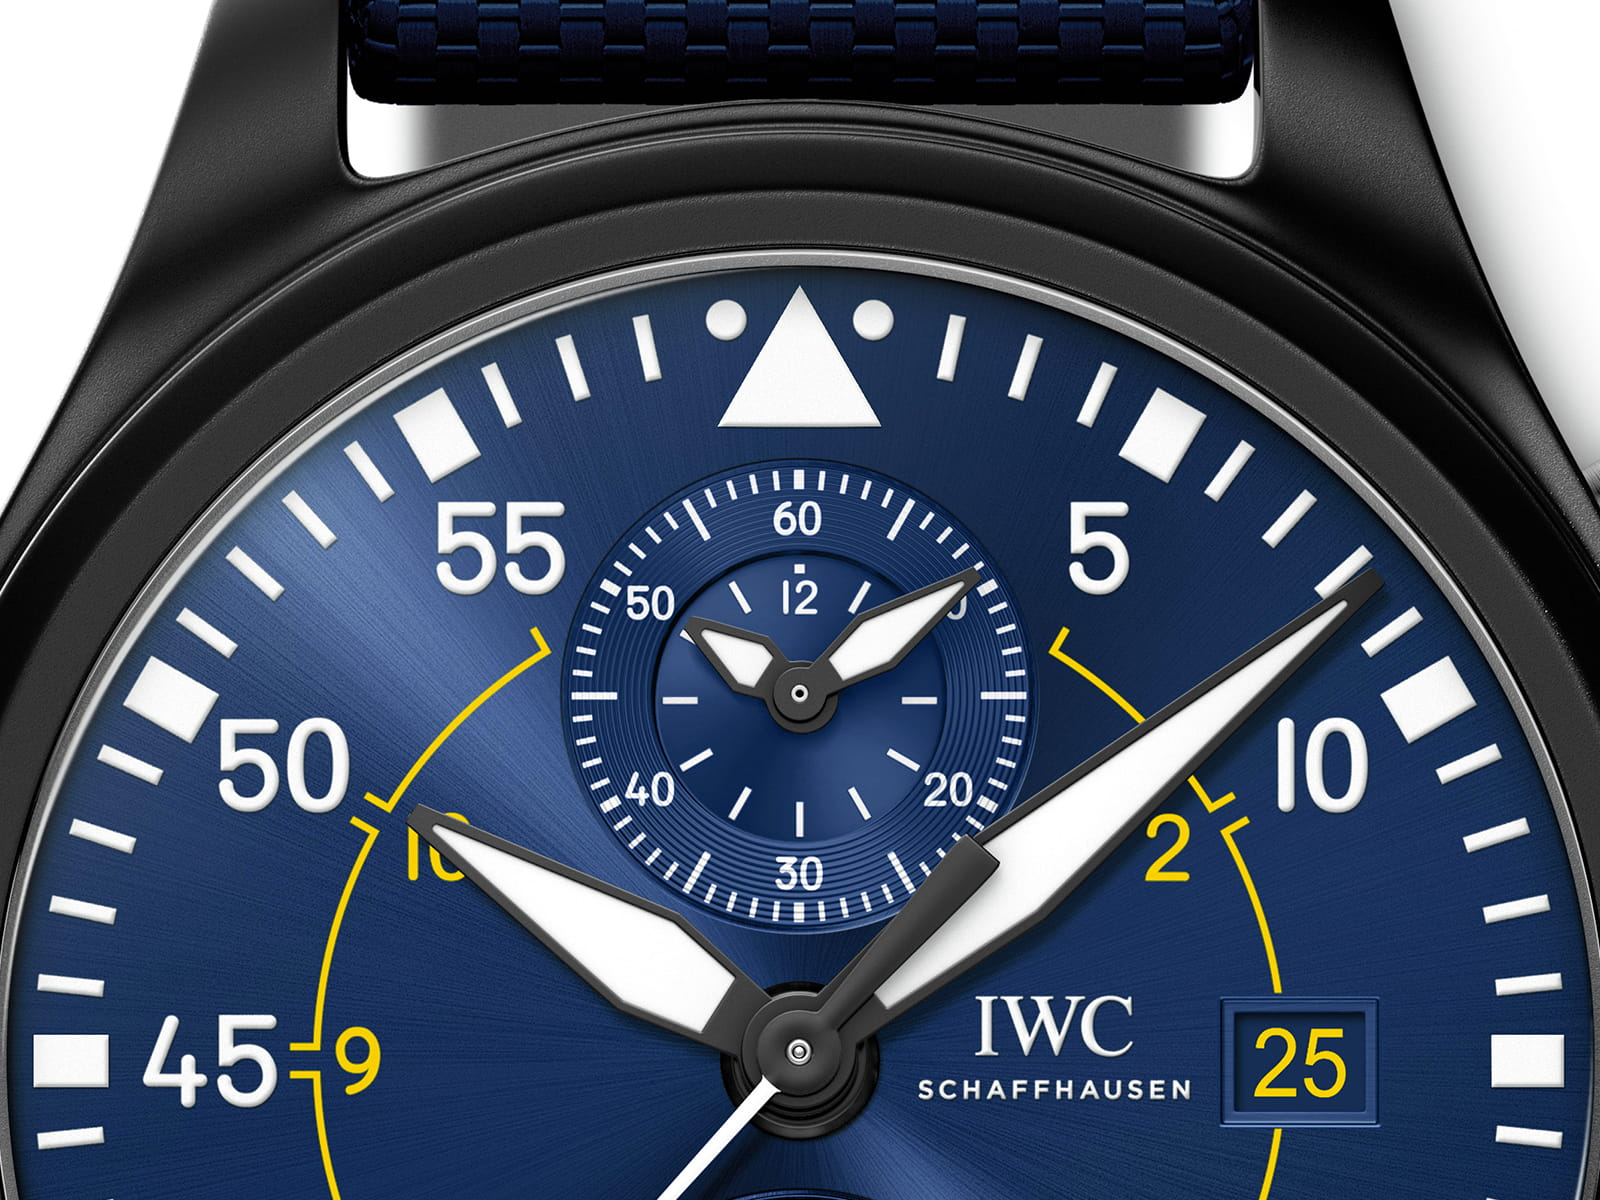 iw389008-iwc-schaffhausen-pilot-s-watch-chronograph-edition-blue-angels-5.jpg